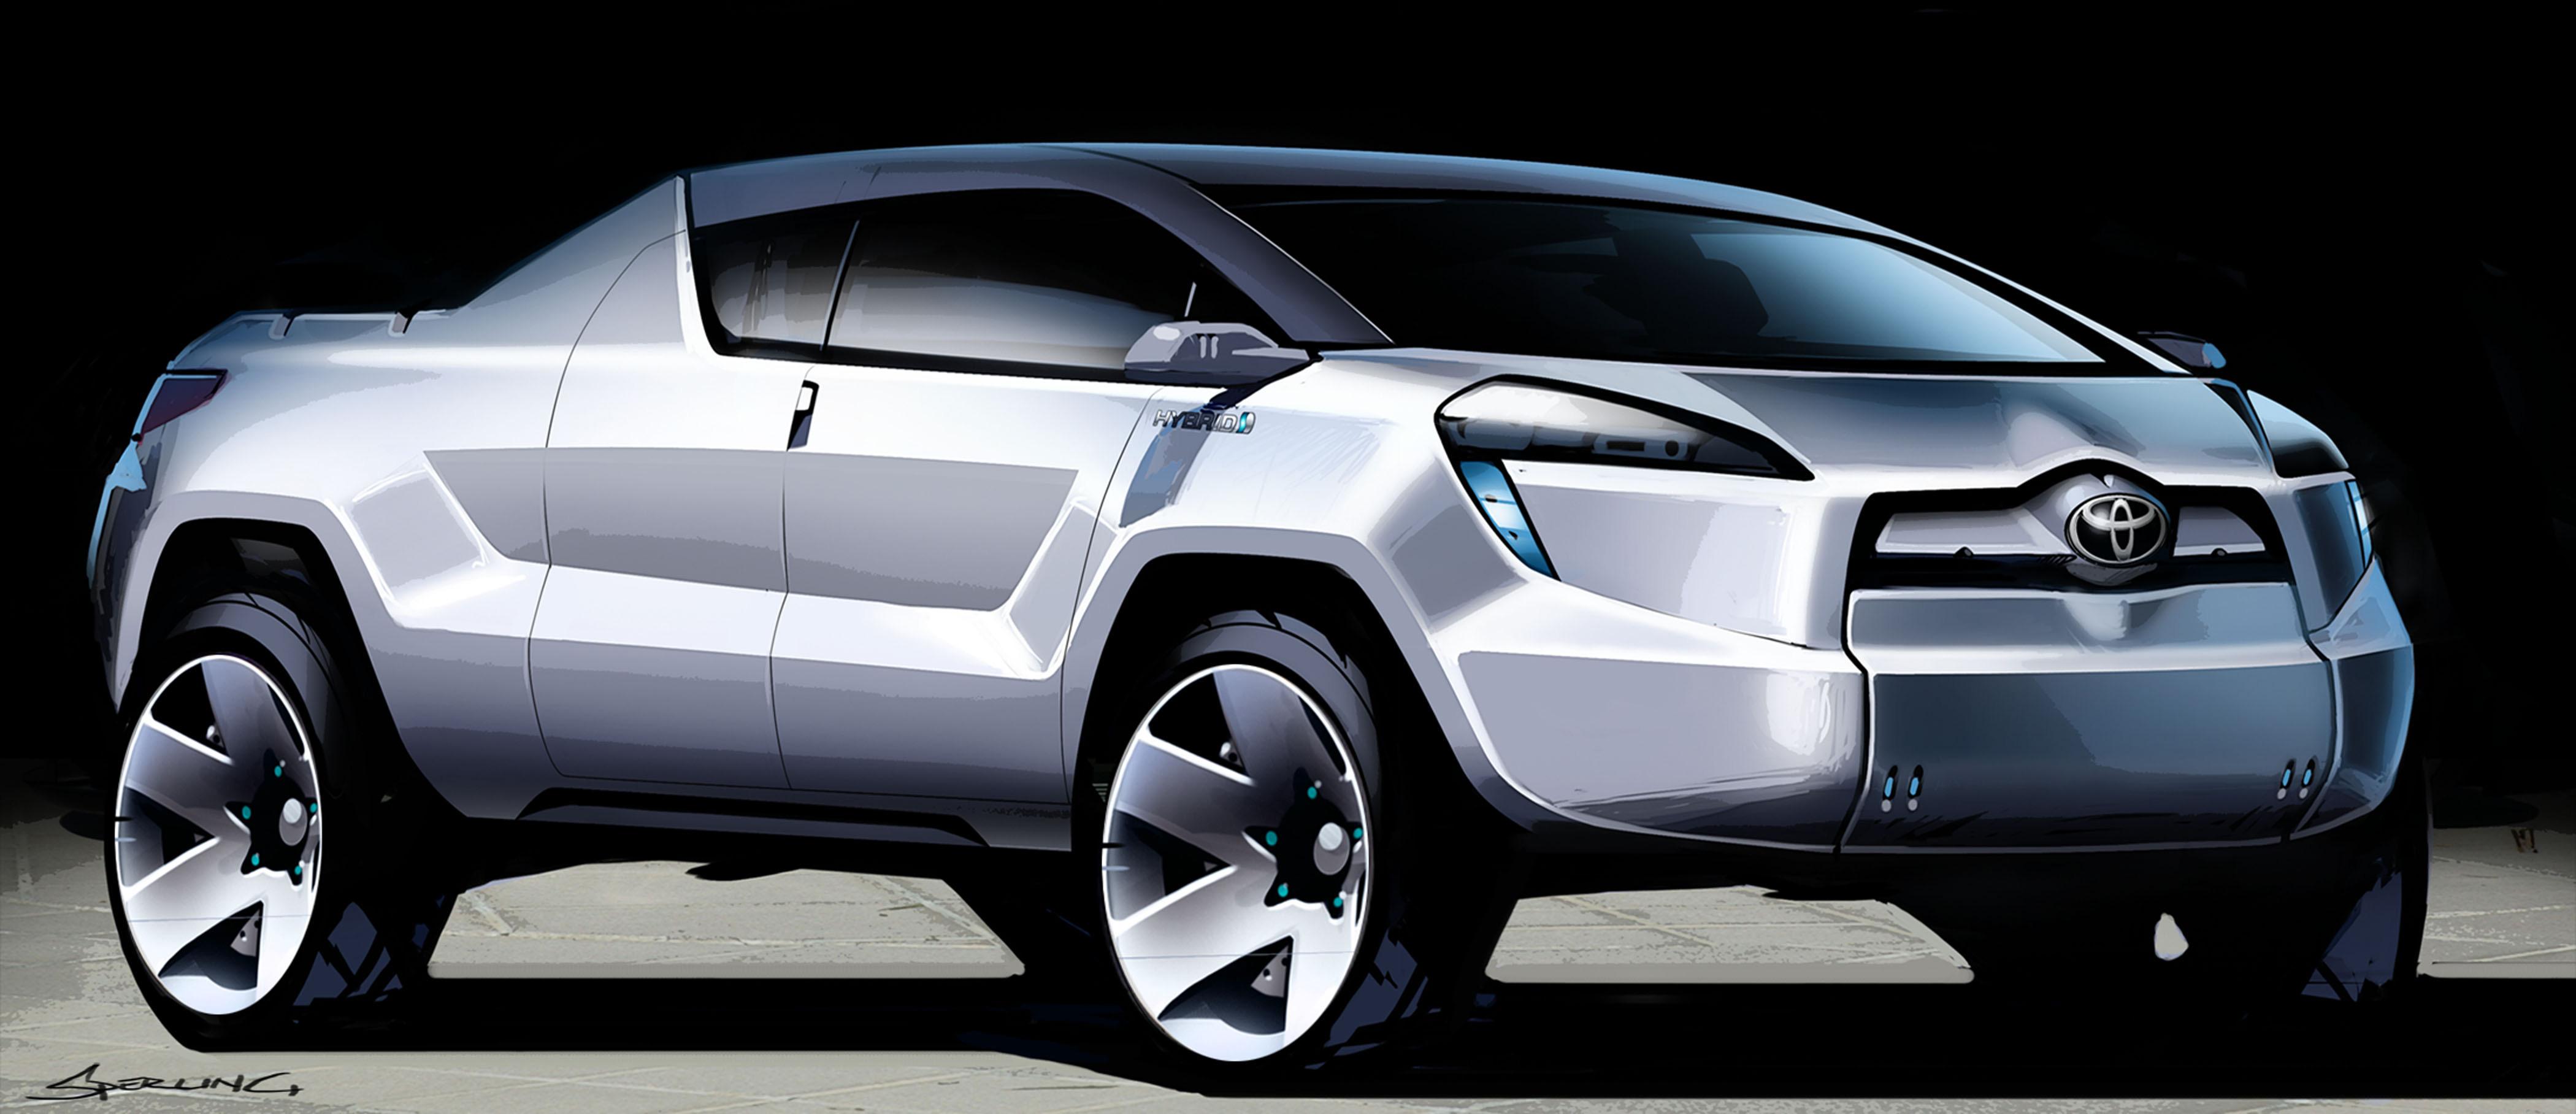 Toyota Ft 1 >> Calty: Automotive Creativity Spanning Five Decades | TOYOTA Global Newsroom